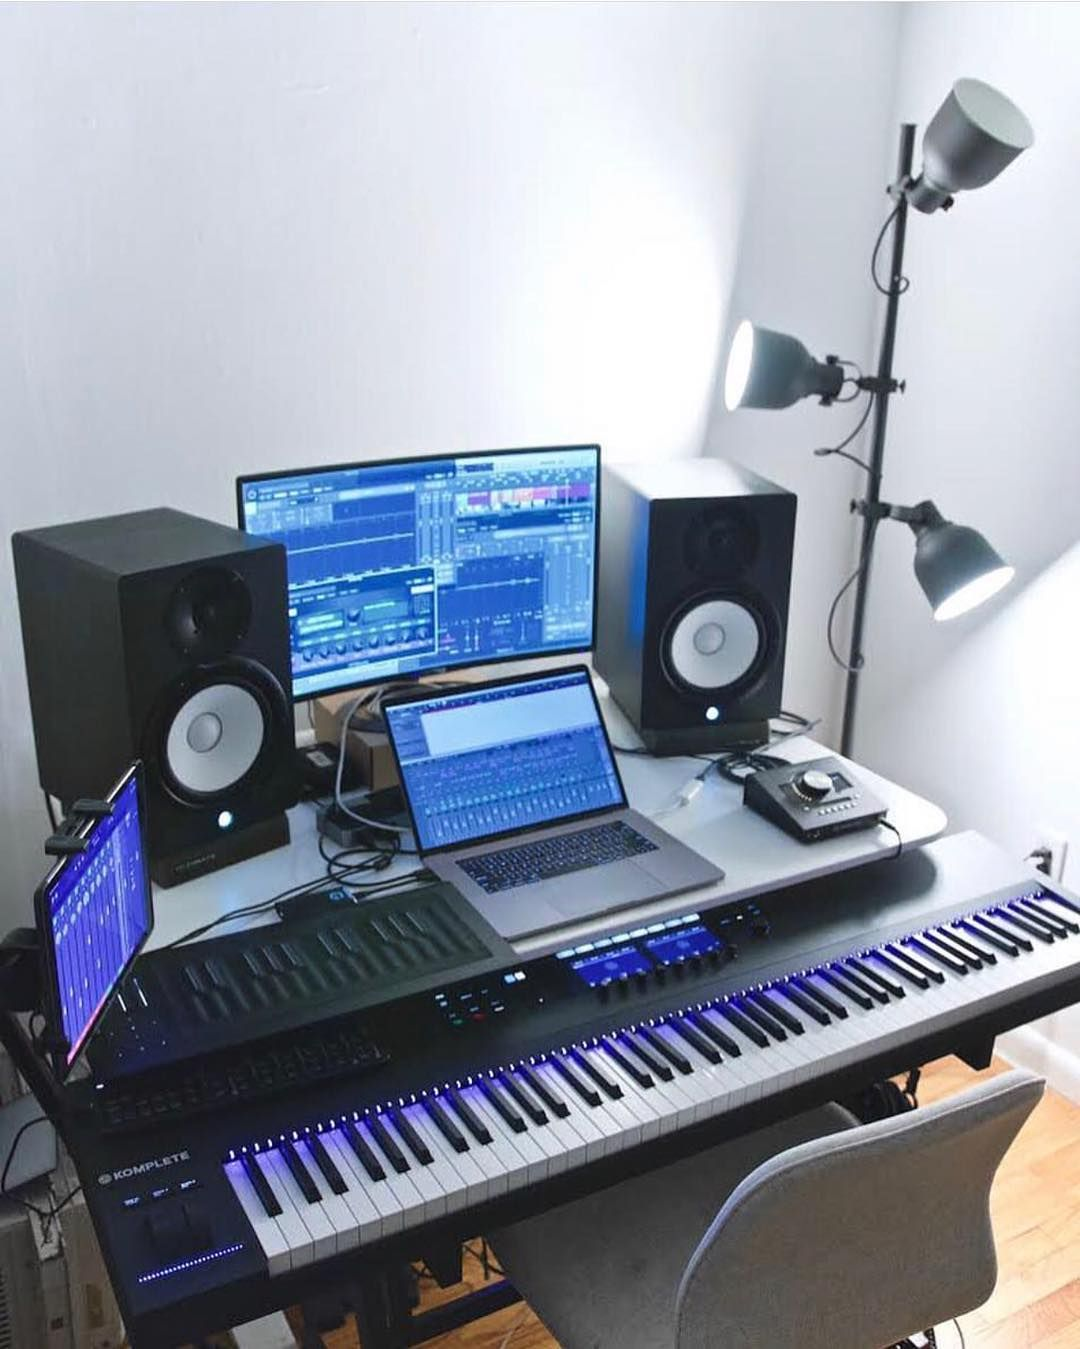 Musicianlifeofficial 54277384 2362019397361548 9057166471153386672 N Musicianlifeofficial Dev Home Recording Studio Setup Music Studio Room Home Studio Setup